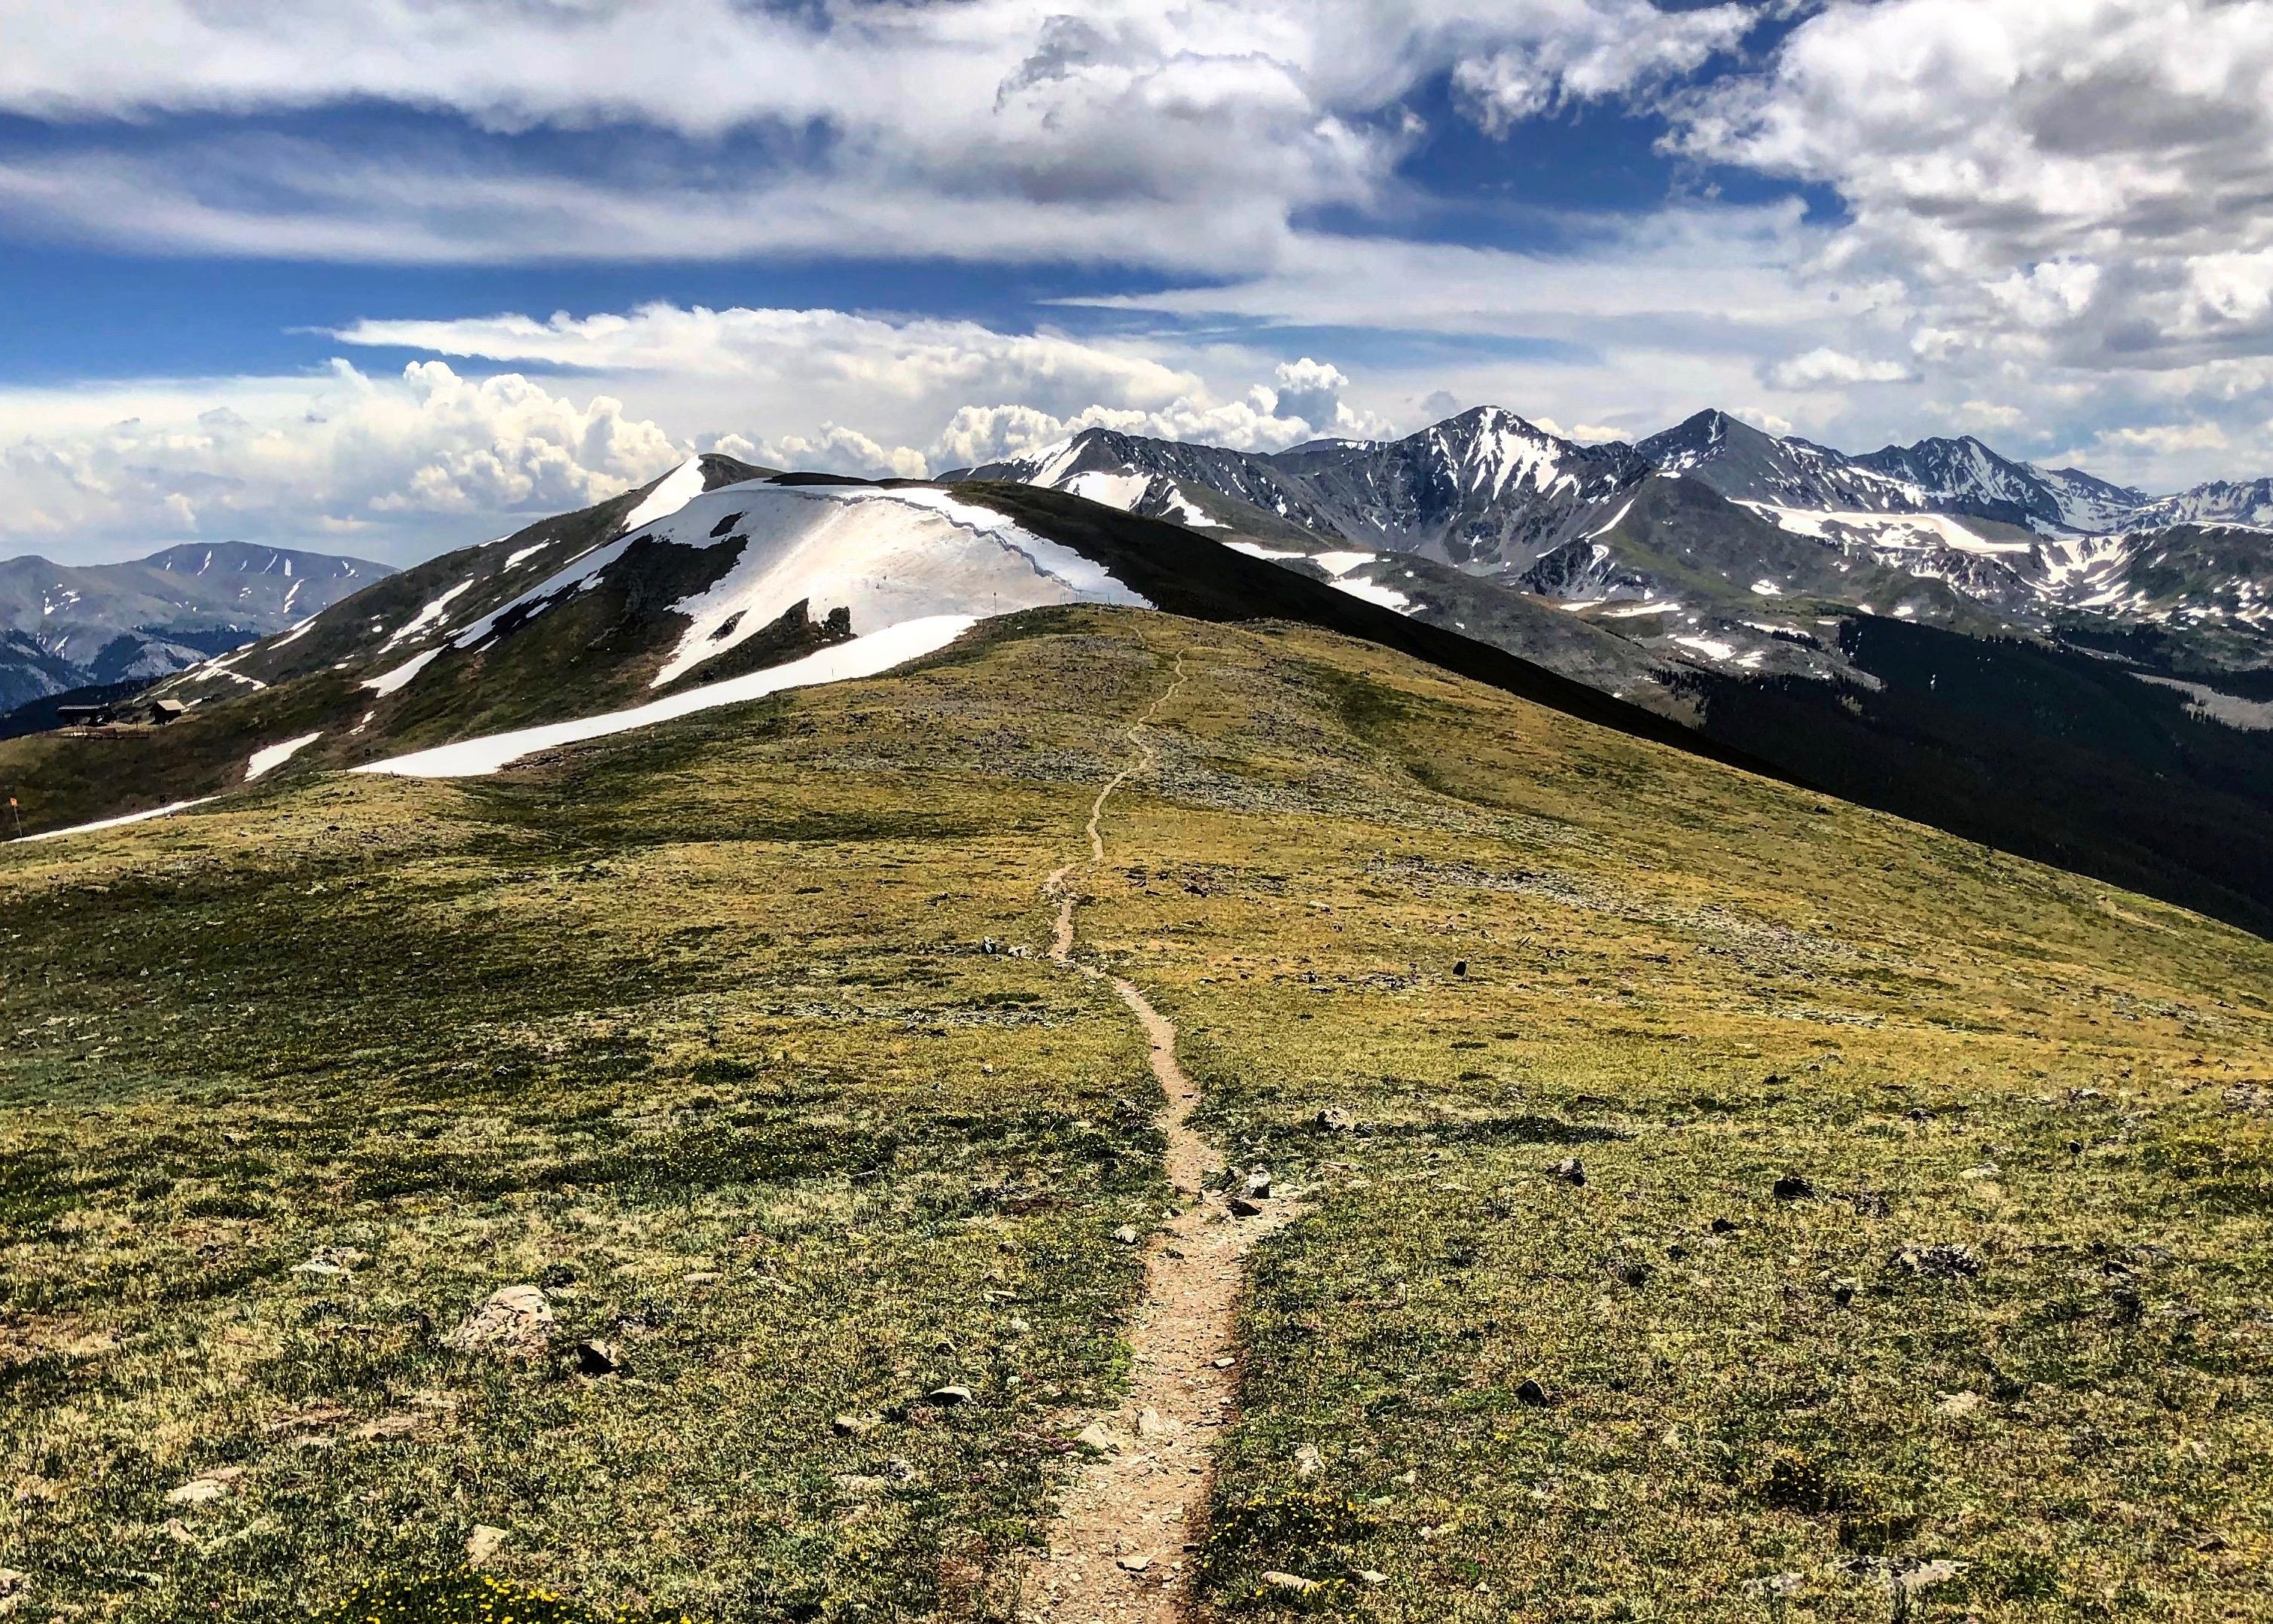 The PCT and Colorado Trail: Thru-Hiking Experience | The Trek thetrek.co